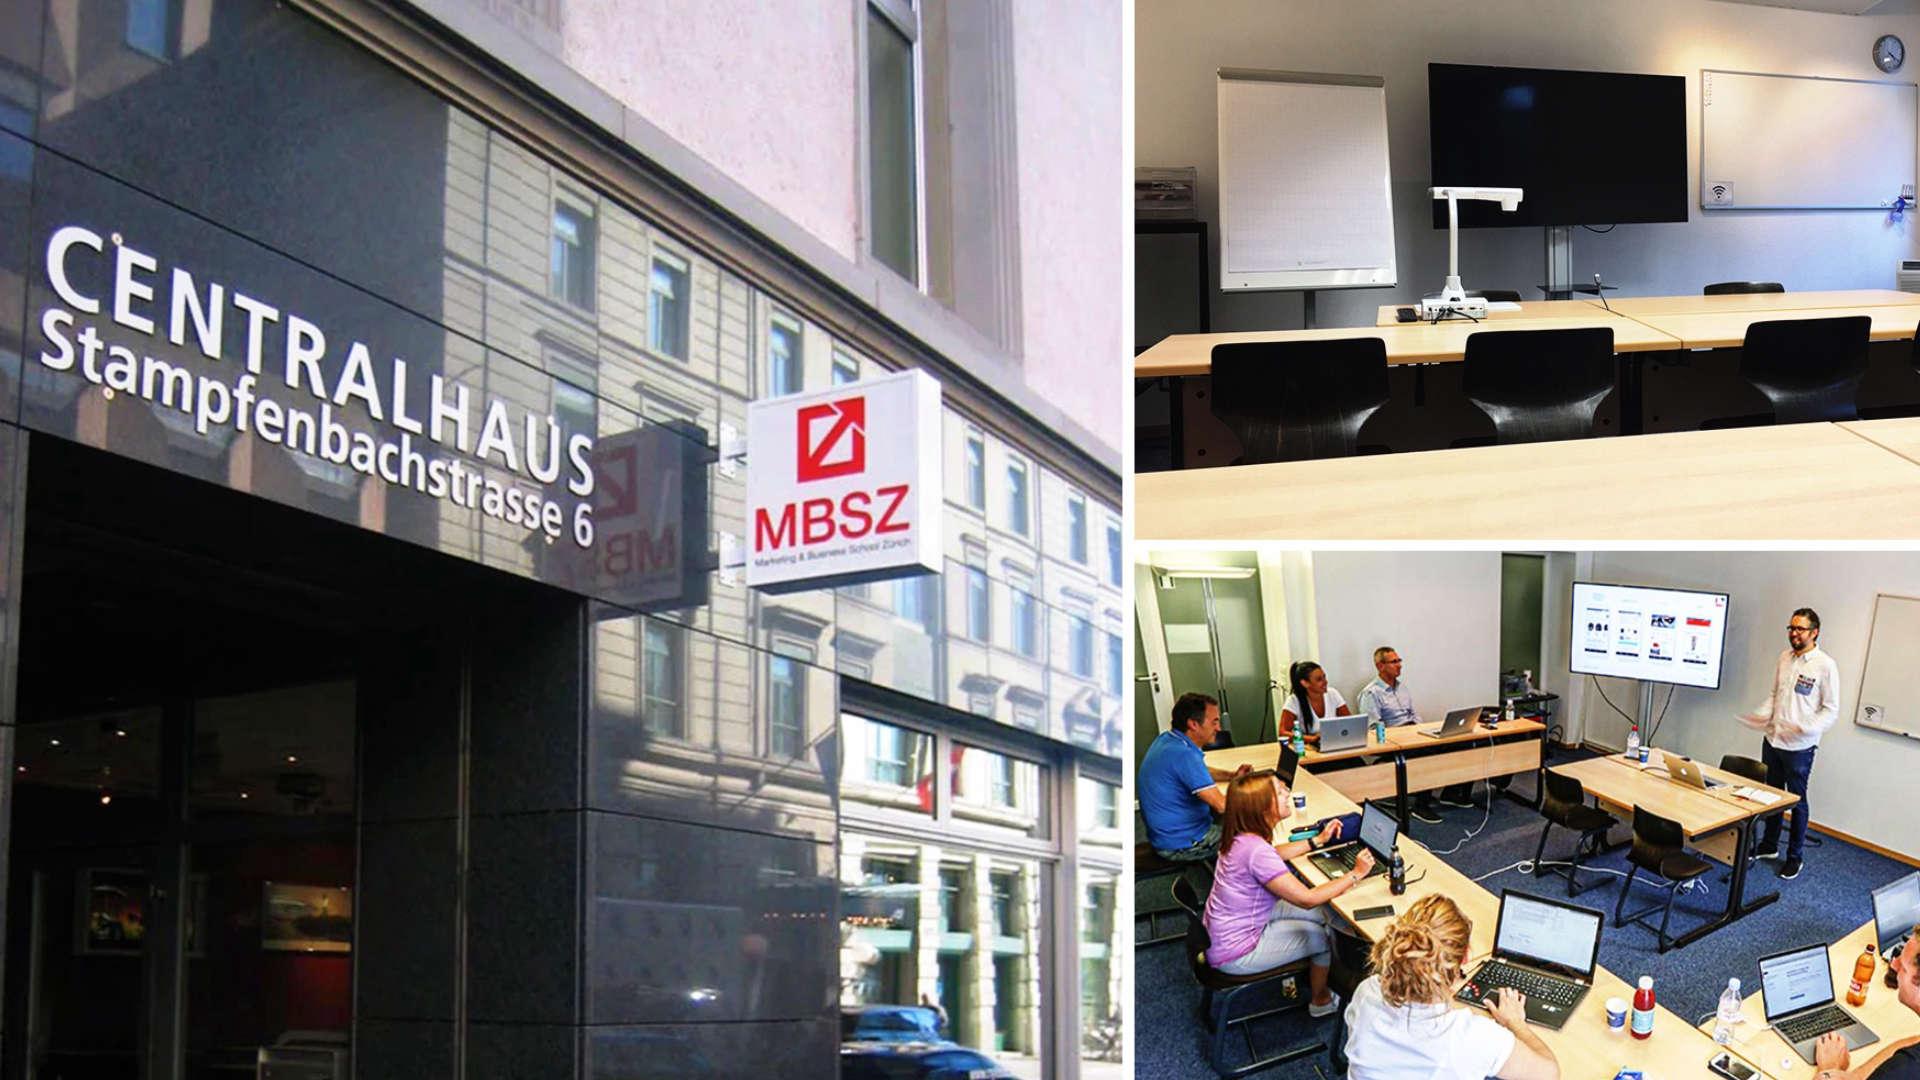 MBSZ - Marketing & Business School Zürich